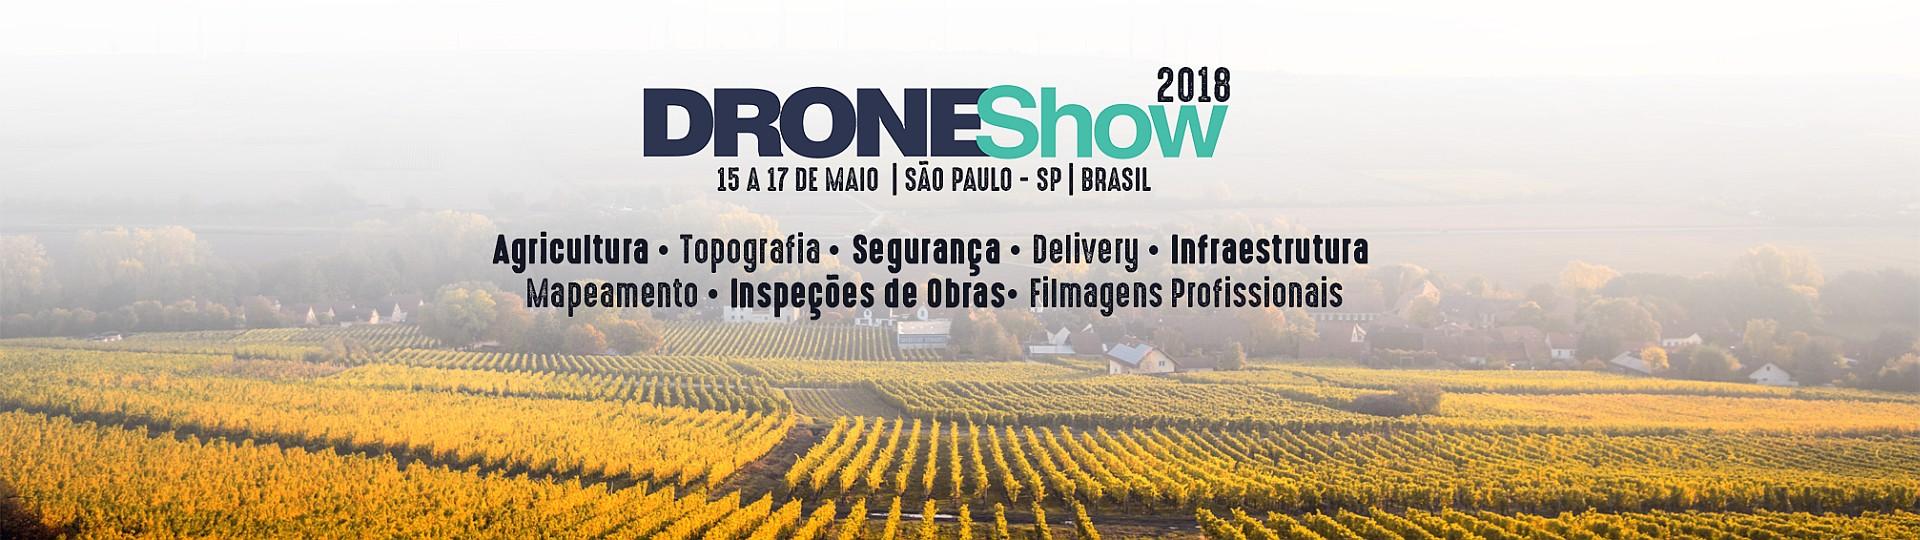 droneshow2018-b